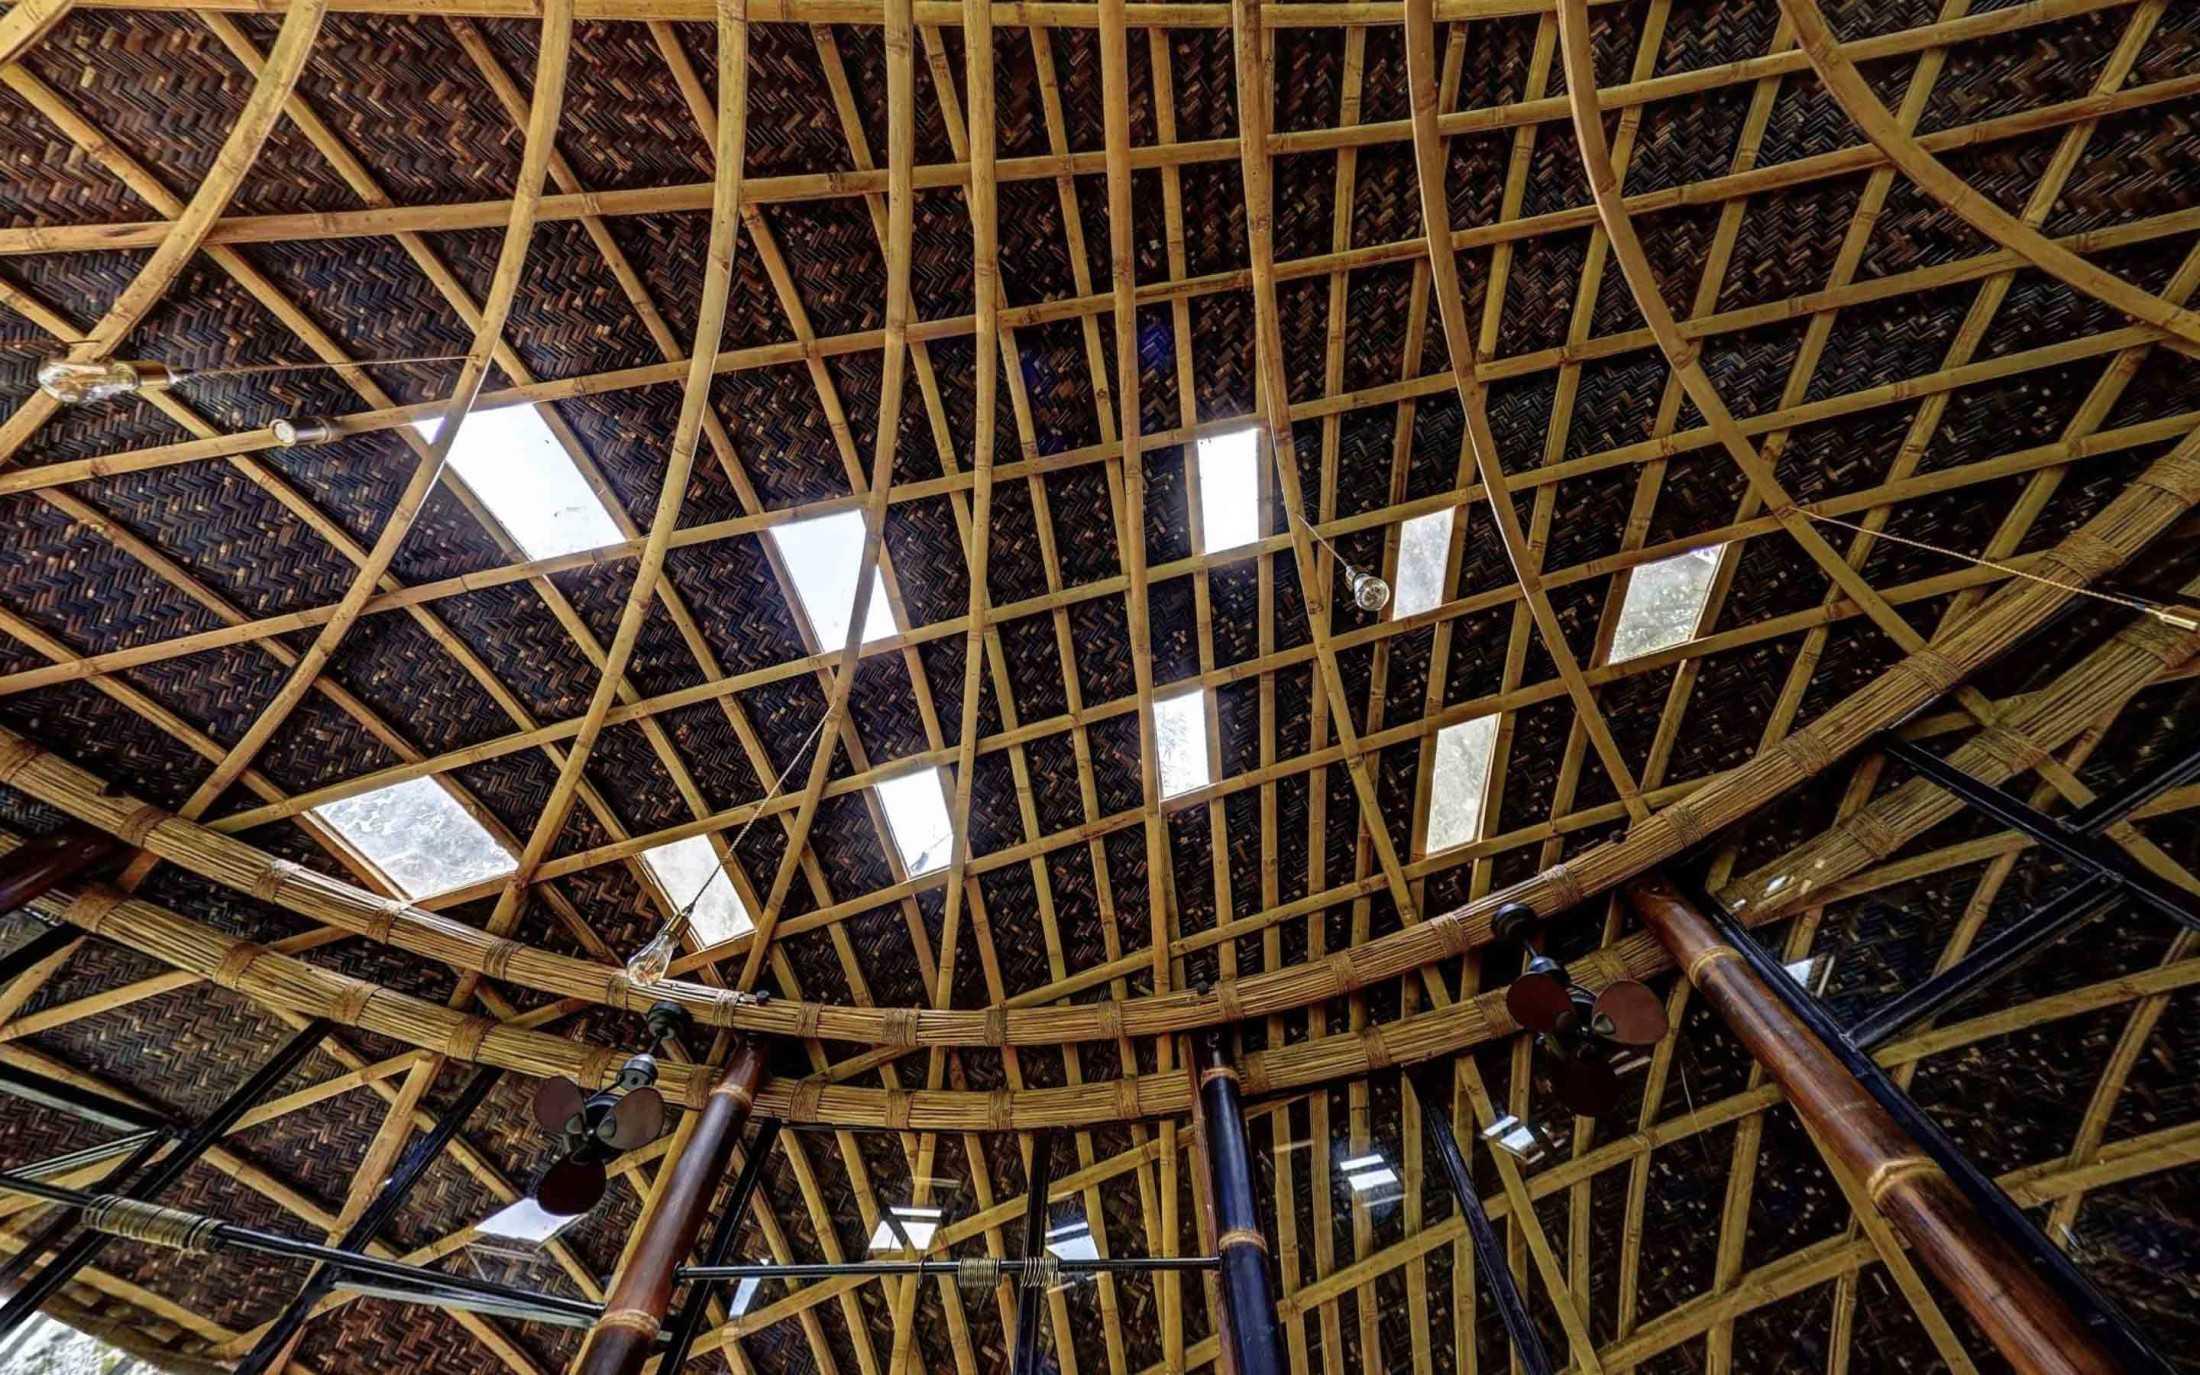 Agung Budi Raharsa | Architecture & Engineering Riverbend Bamboo House - Bali Bali, Indonesia Bali, Indonesia Agung-Budi-Raharsa-Riverbend-House-Bali  88719